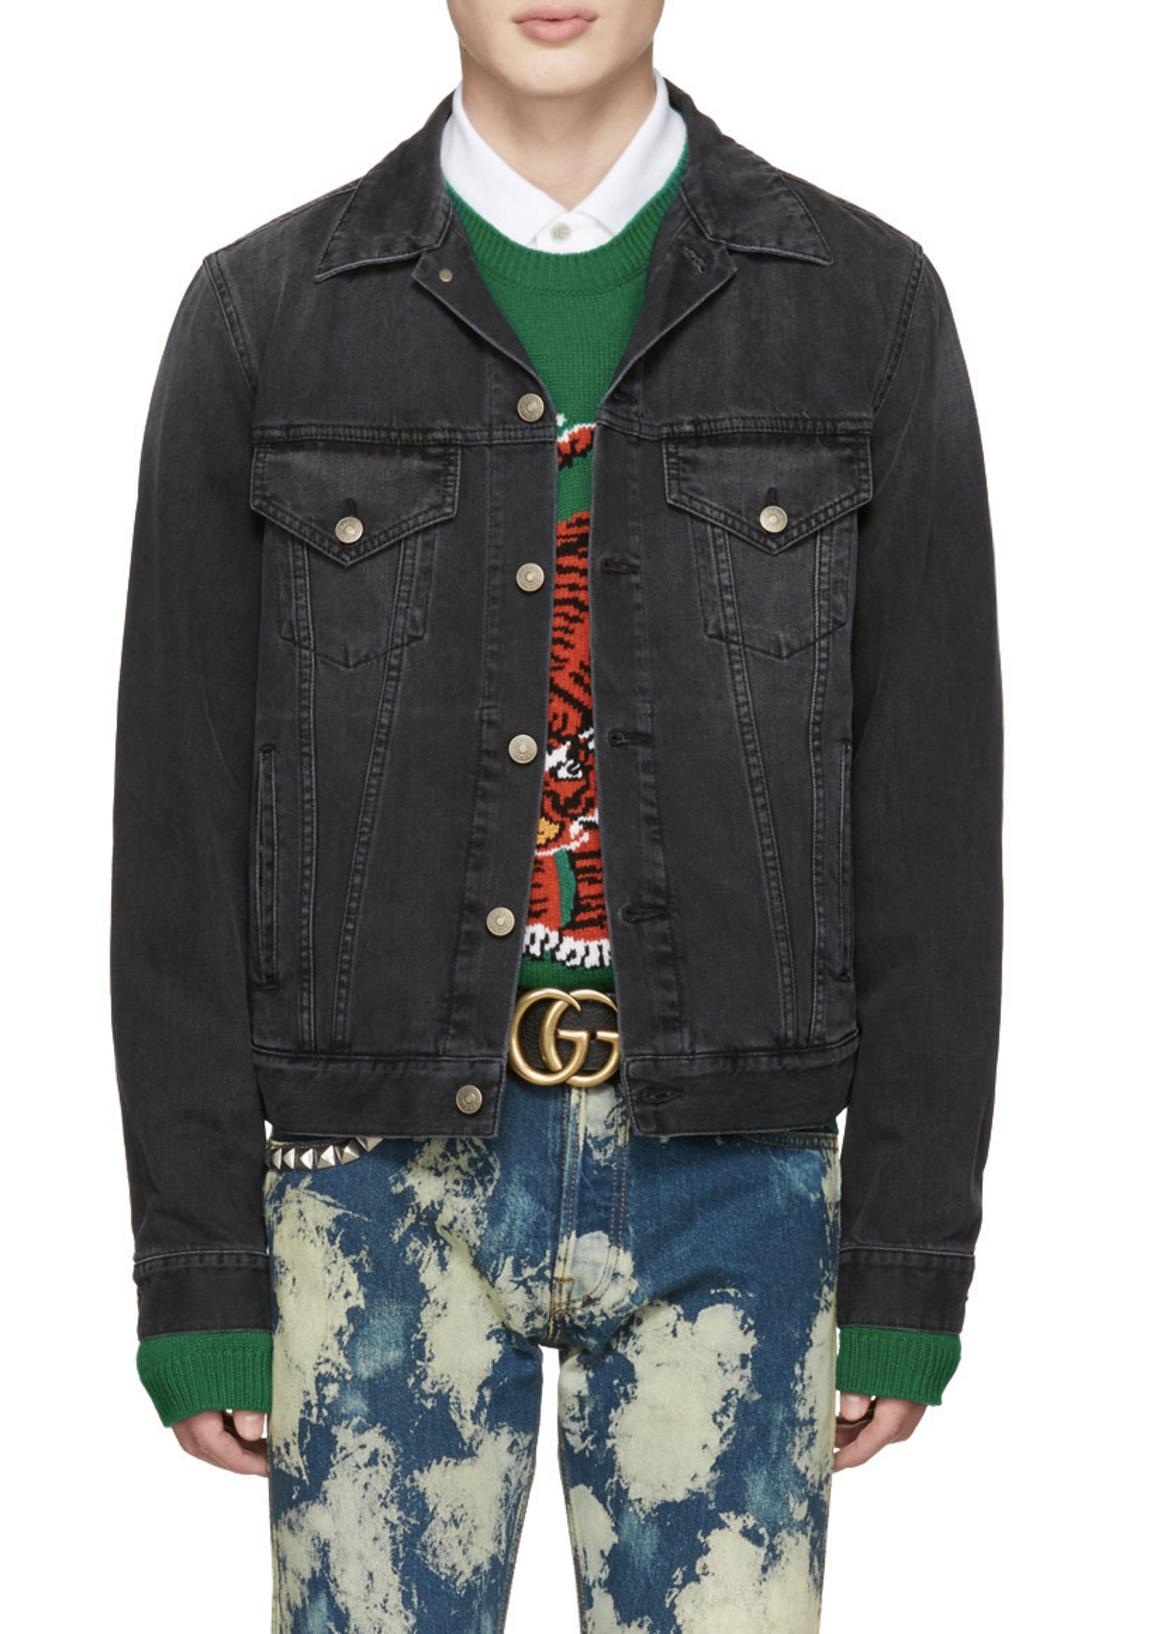 dfeb5c914 Gucci Black Denim 'L'Aveugle Par Amour' Jacket from SSENSE (men, style,  fashion, clothing, shopping, recommendations, stylish, menswear, male,  streetstyle, ...